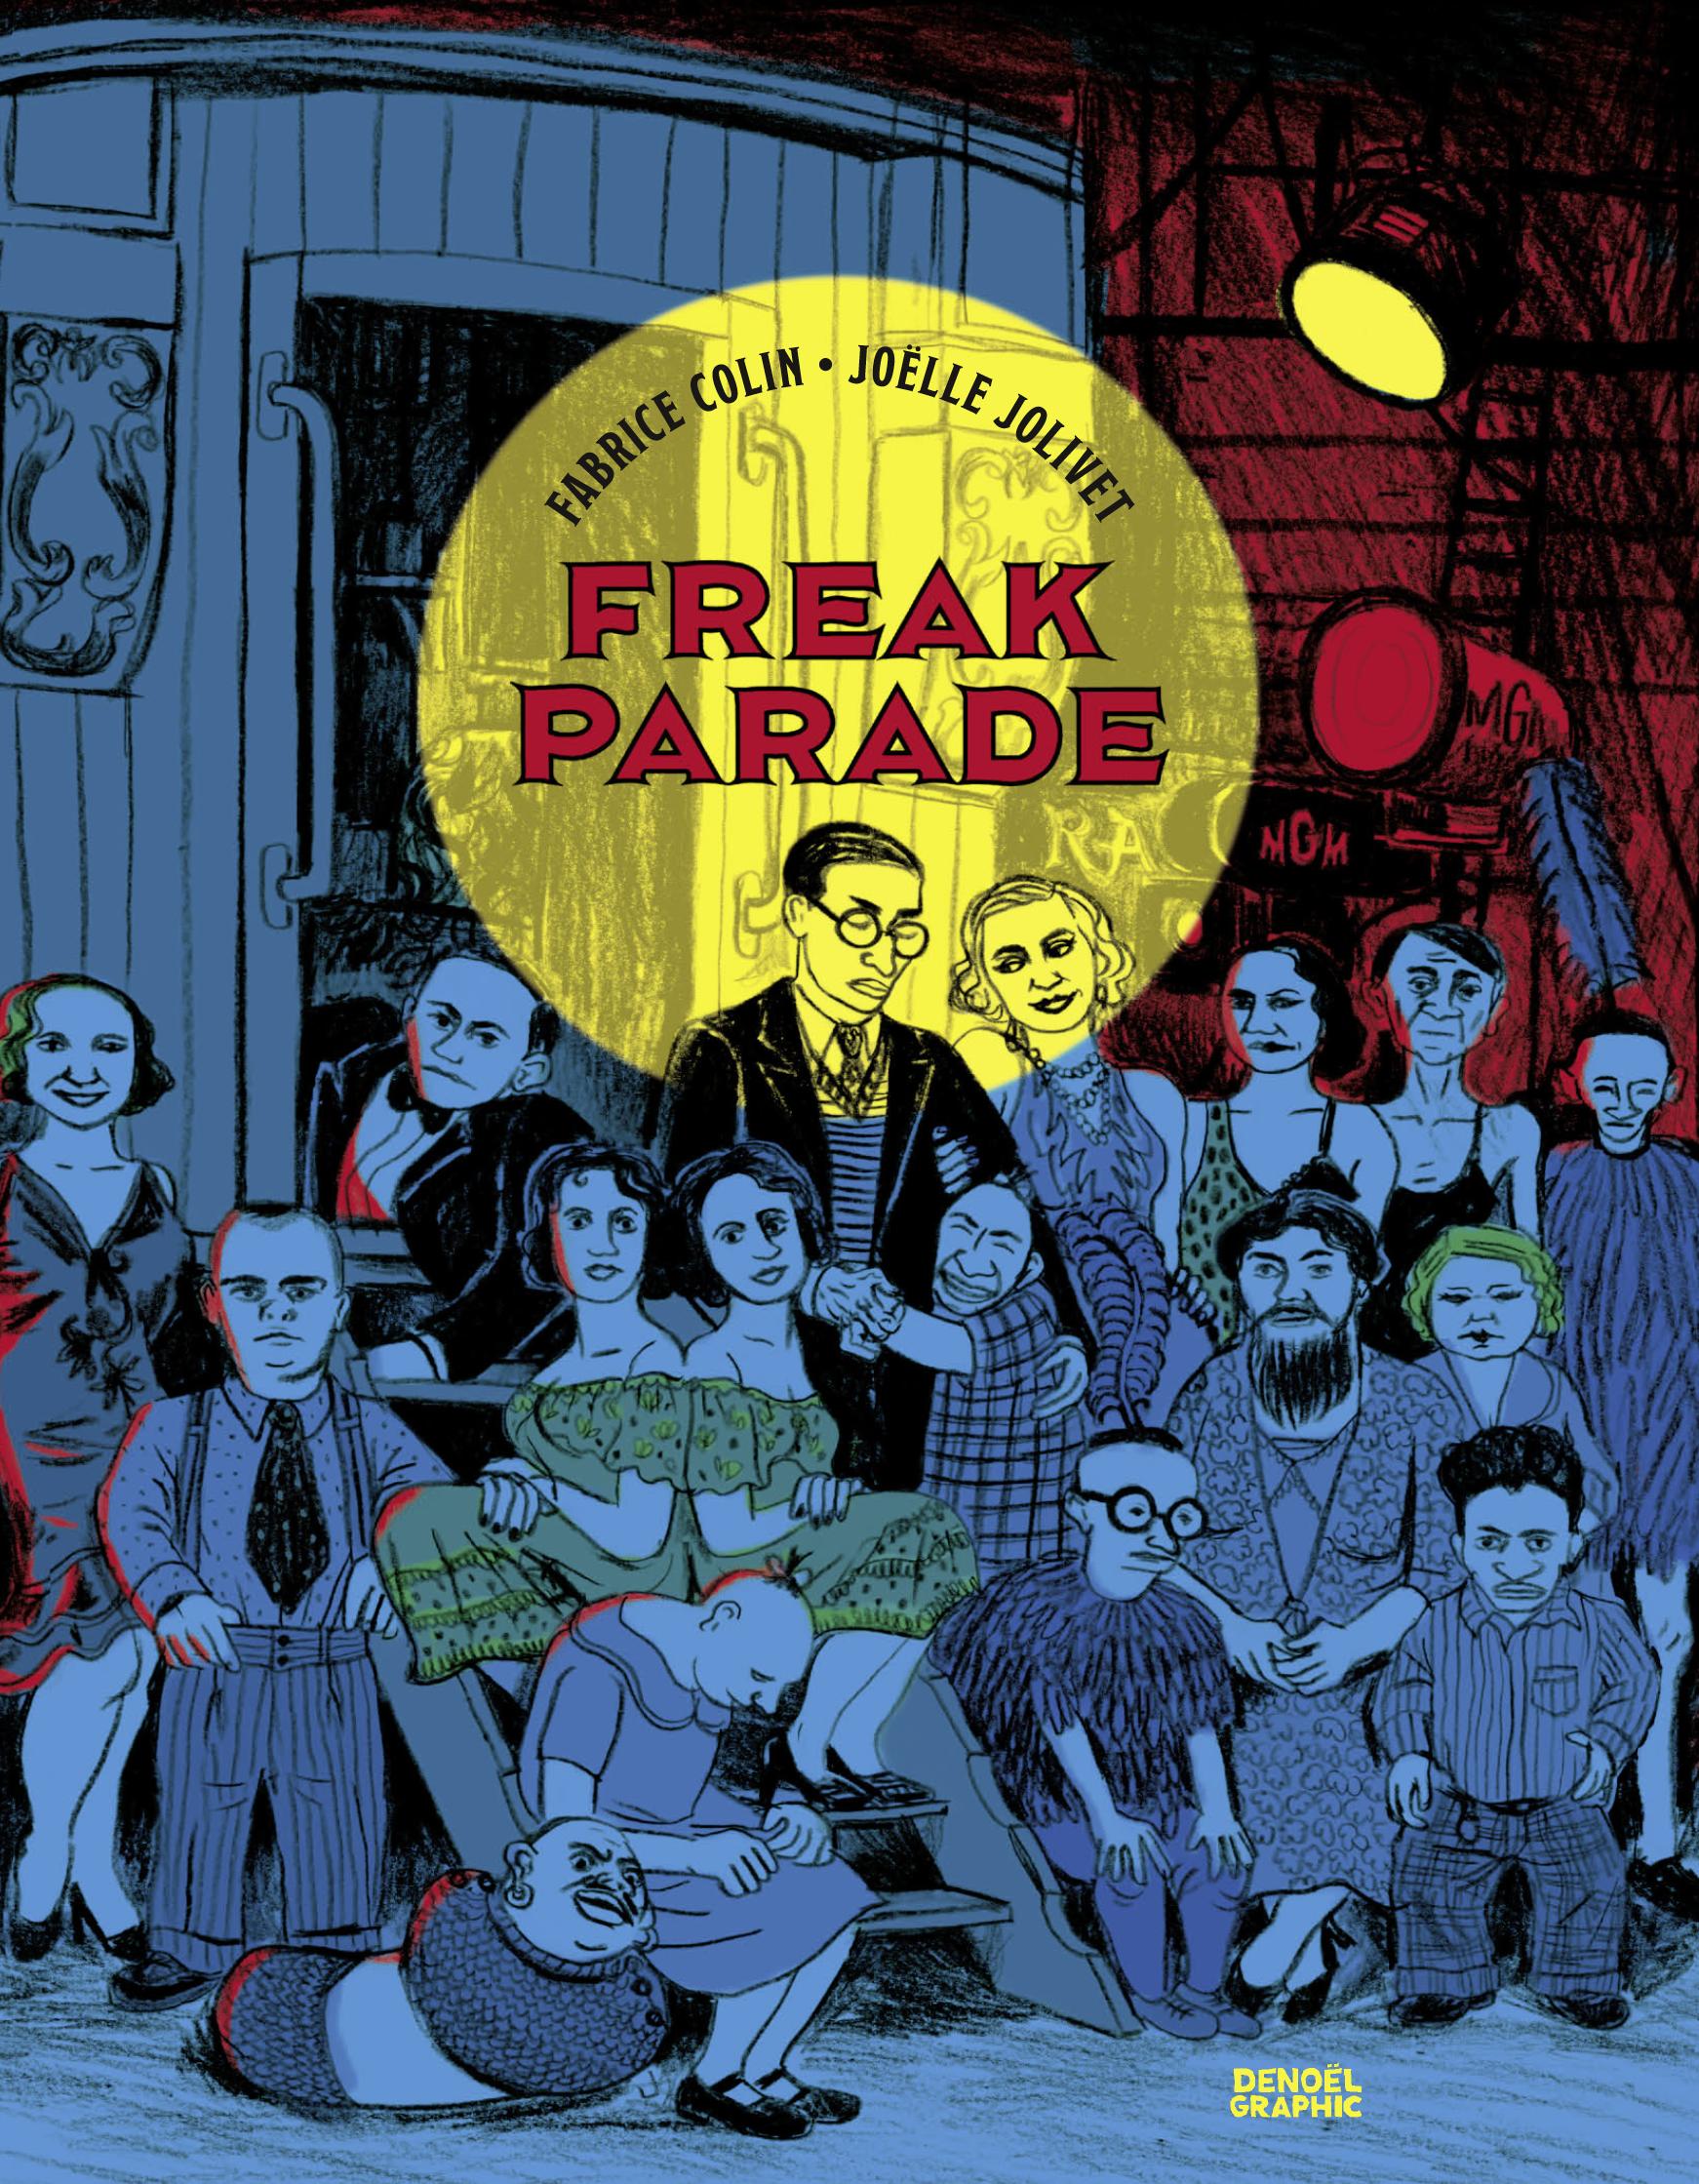 Vignette du livre Freak Parade - Fabrice ) Colin, Joelle Jolivet